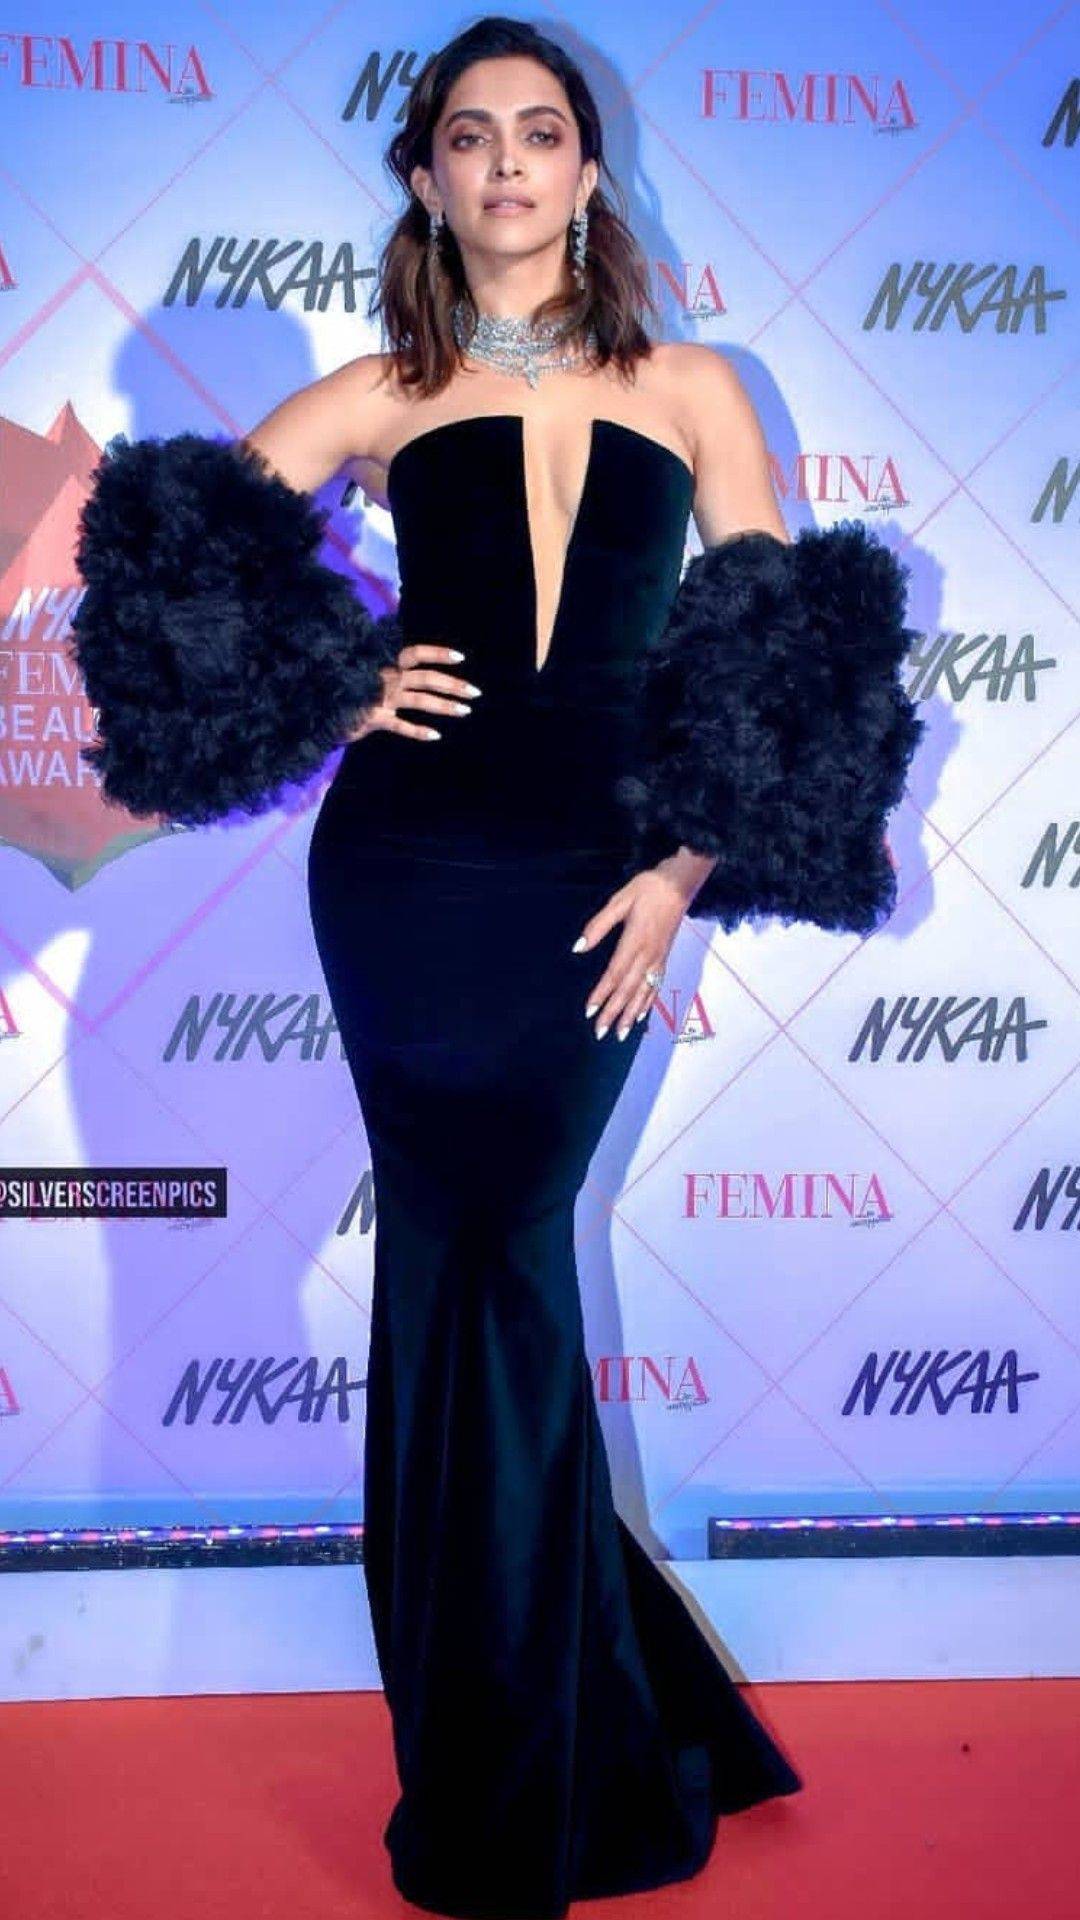 Pin By Vidushi Rathore On Deepika Padukone In 2020 Bollywood Celebrities Formal Dresses Fashion